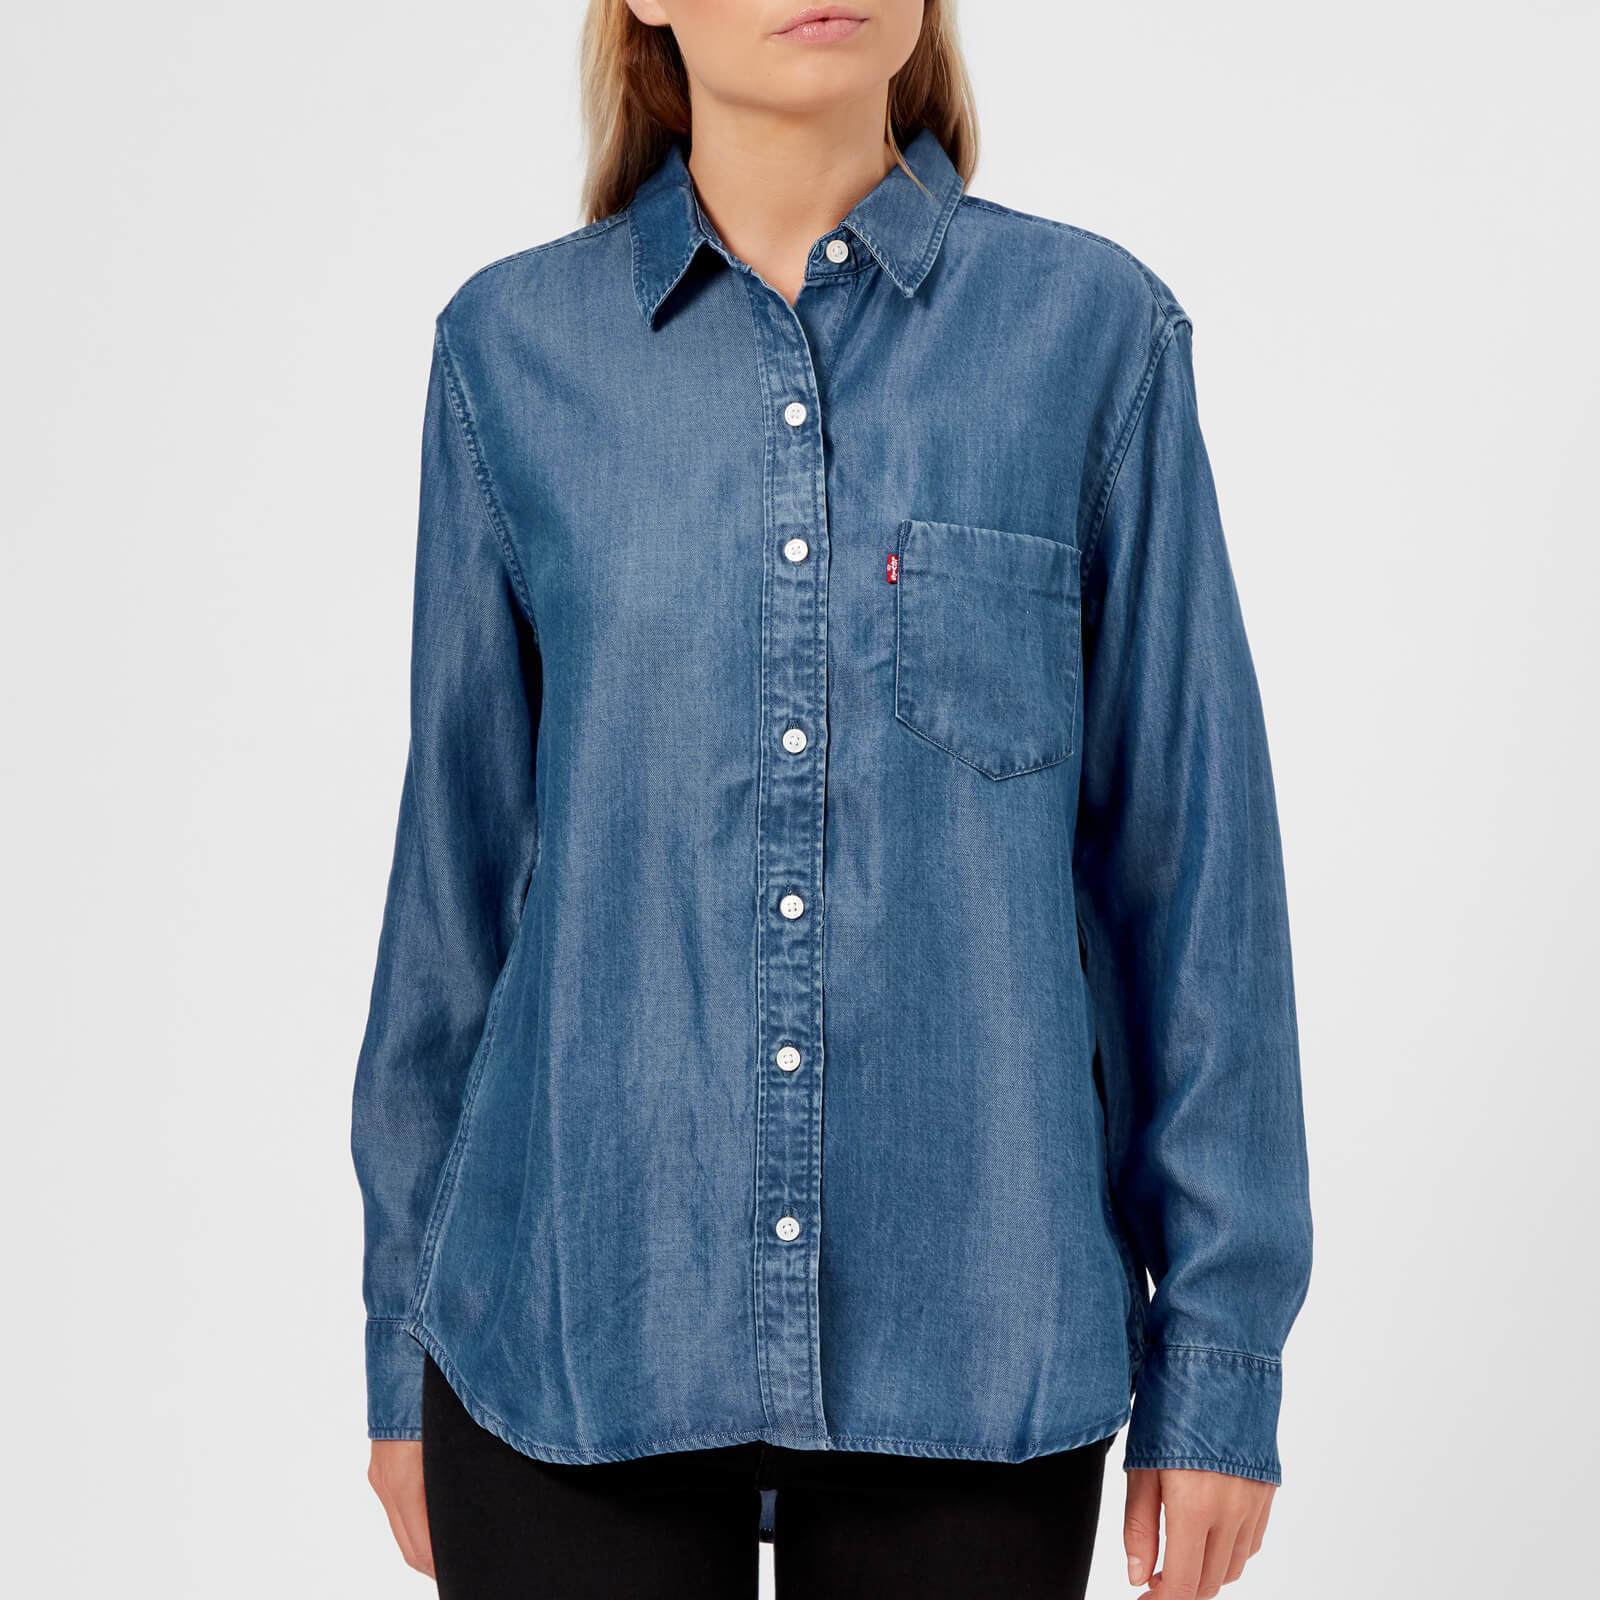 35fc7e8306df8d Levi's Women's Ultimate Boyfriend Shirt - Medium Authentic Womens Clothing  | TheHut.com